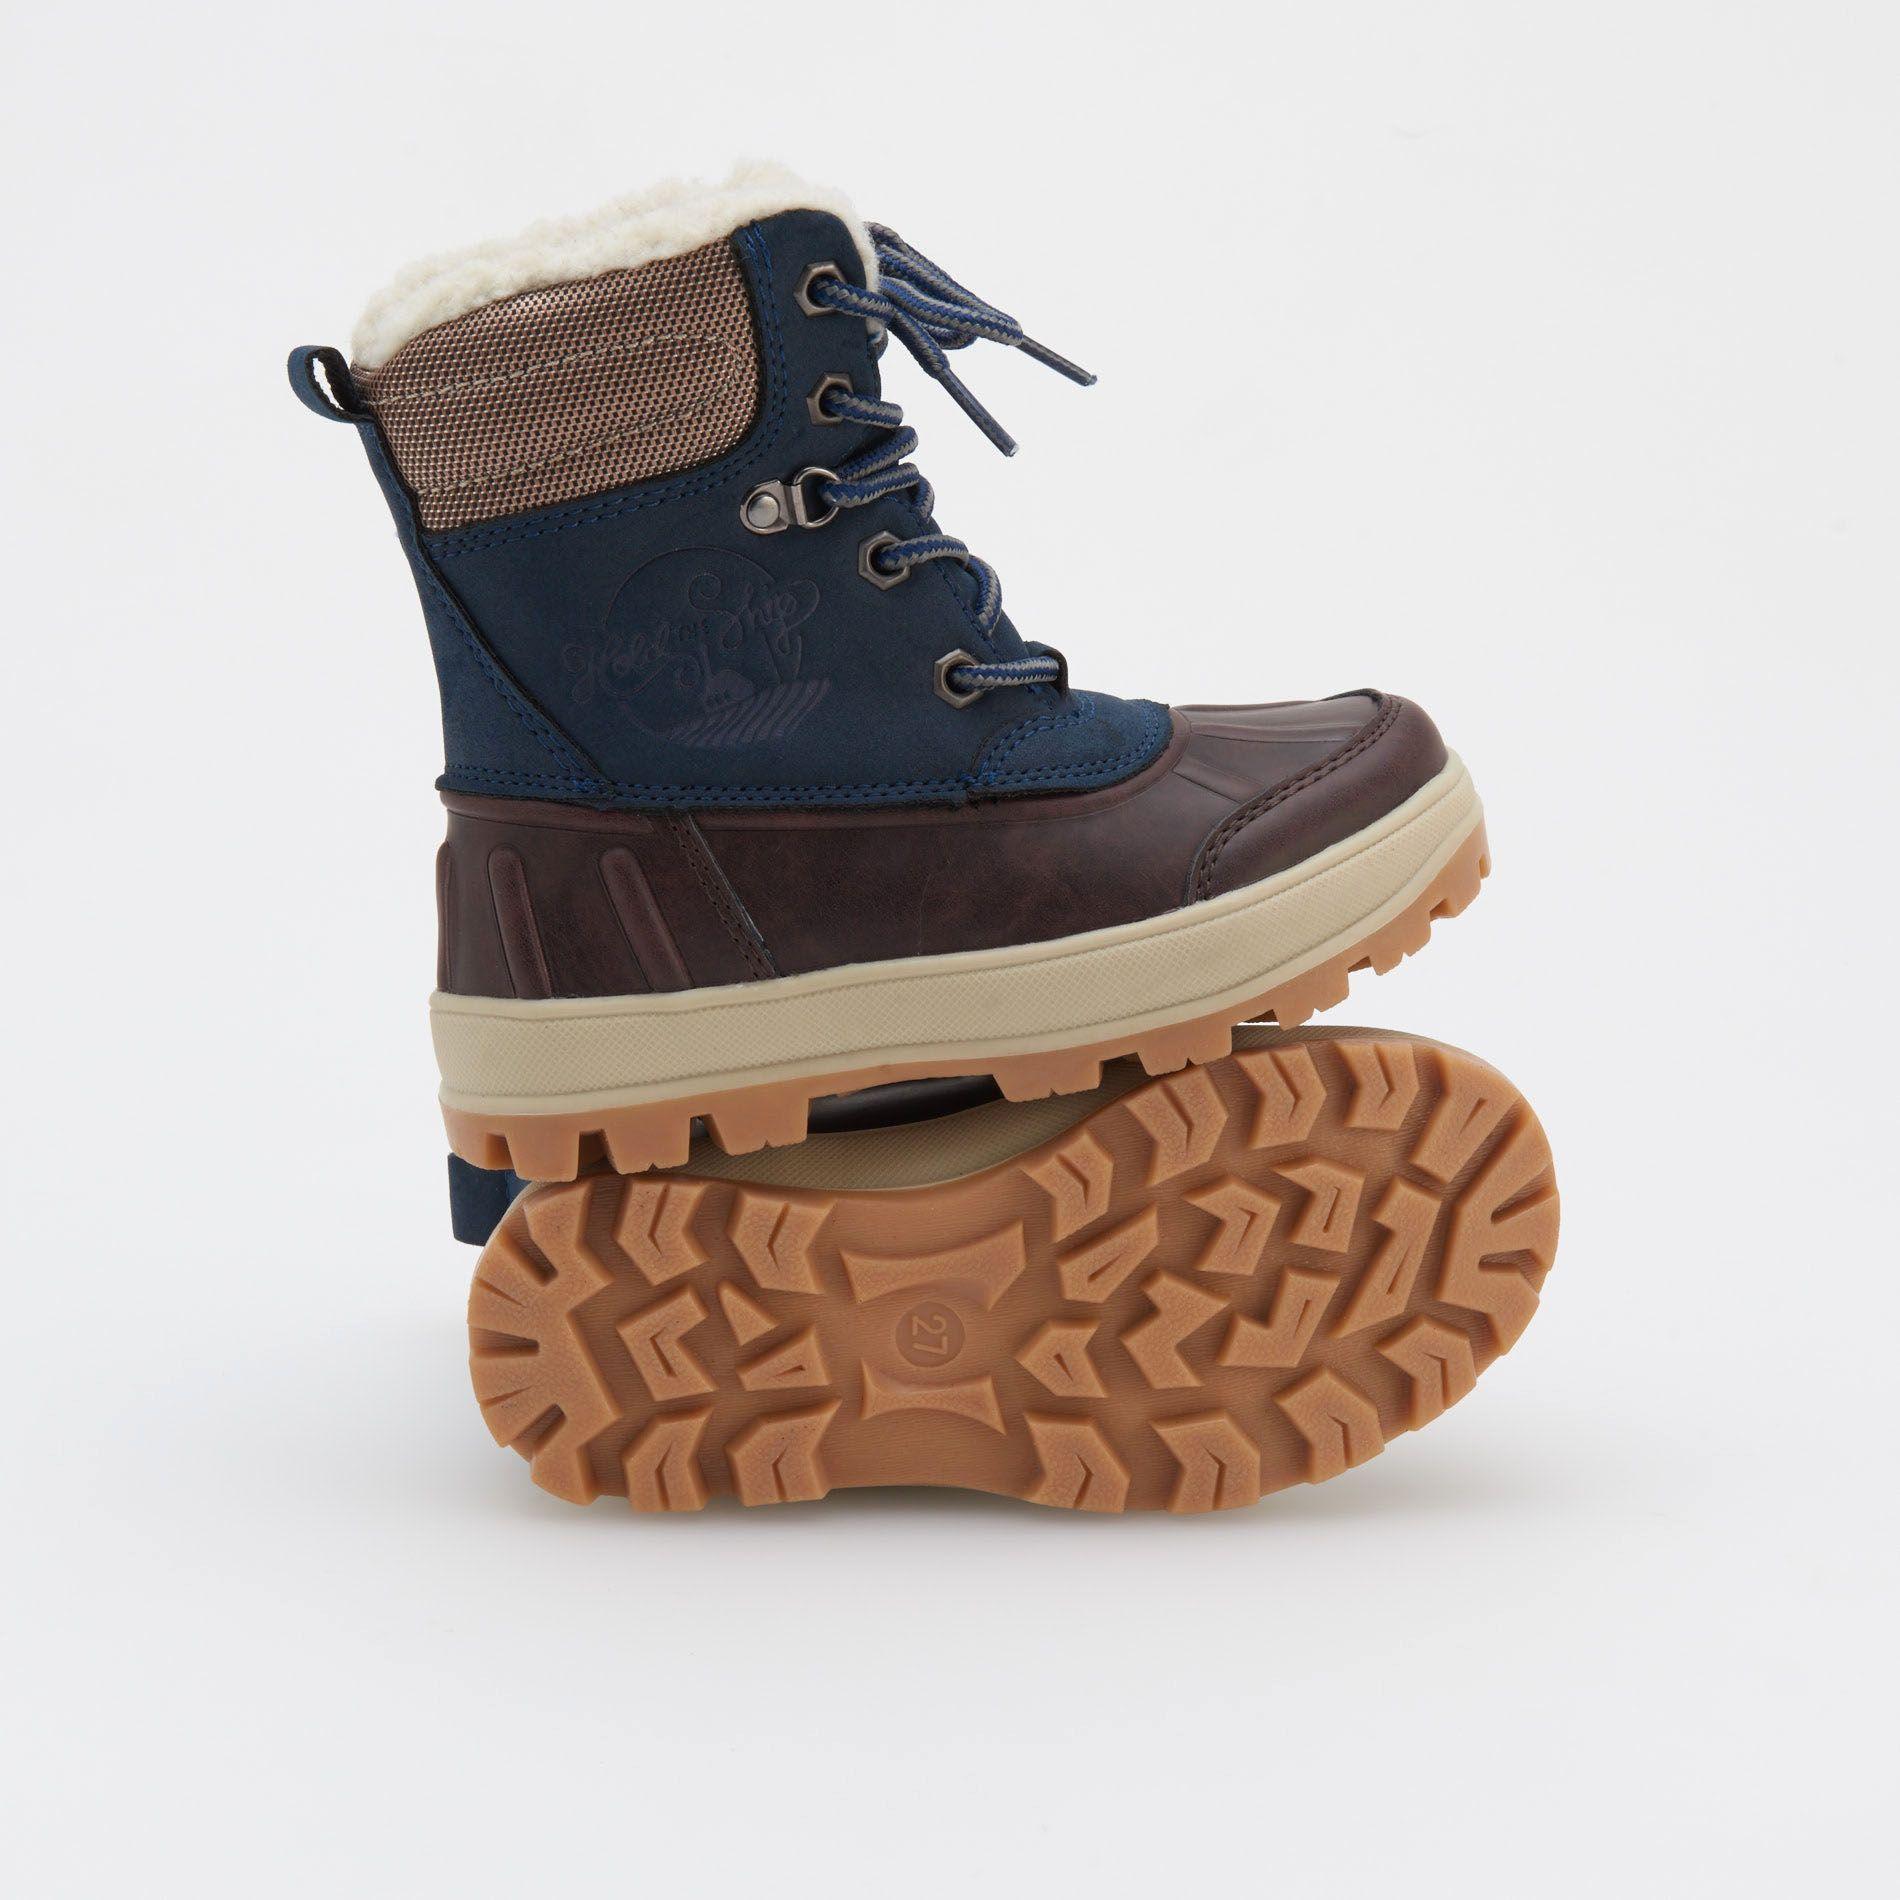 Zimowe Buty Z Kozuszkiem Reserved Boots Winter Boots Shoes